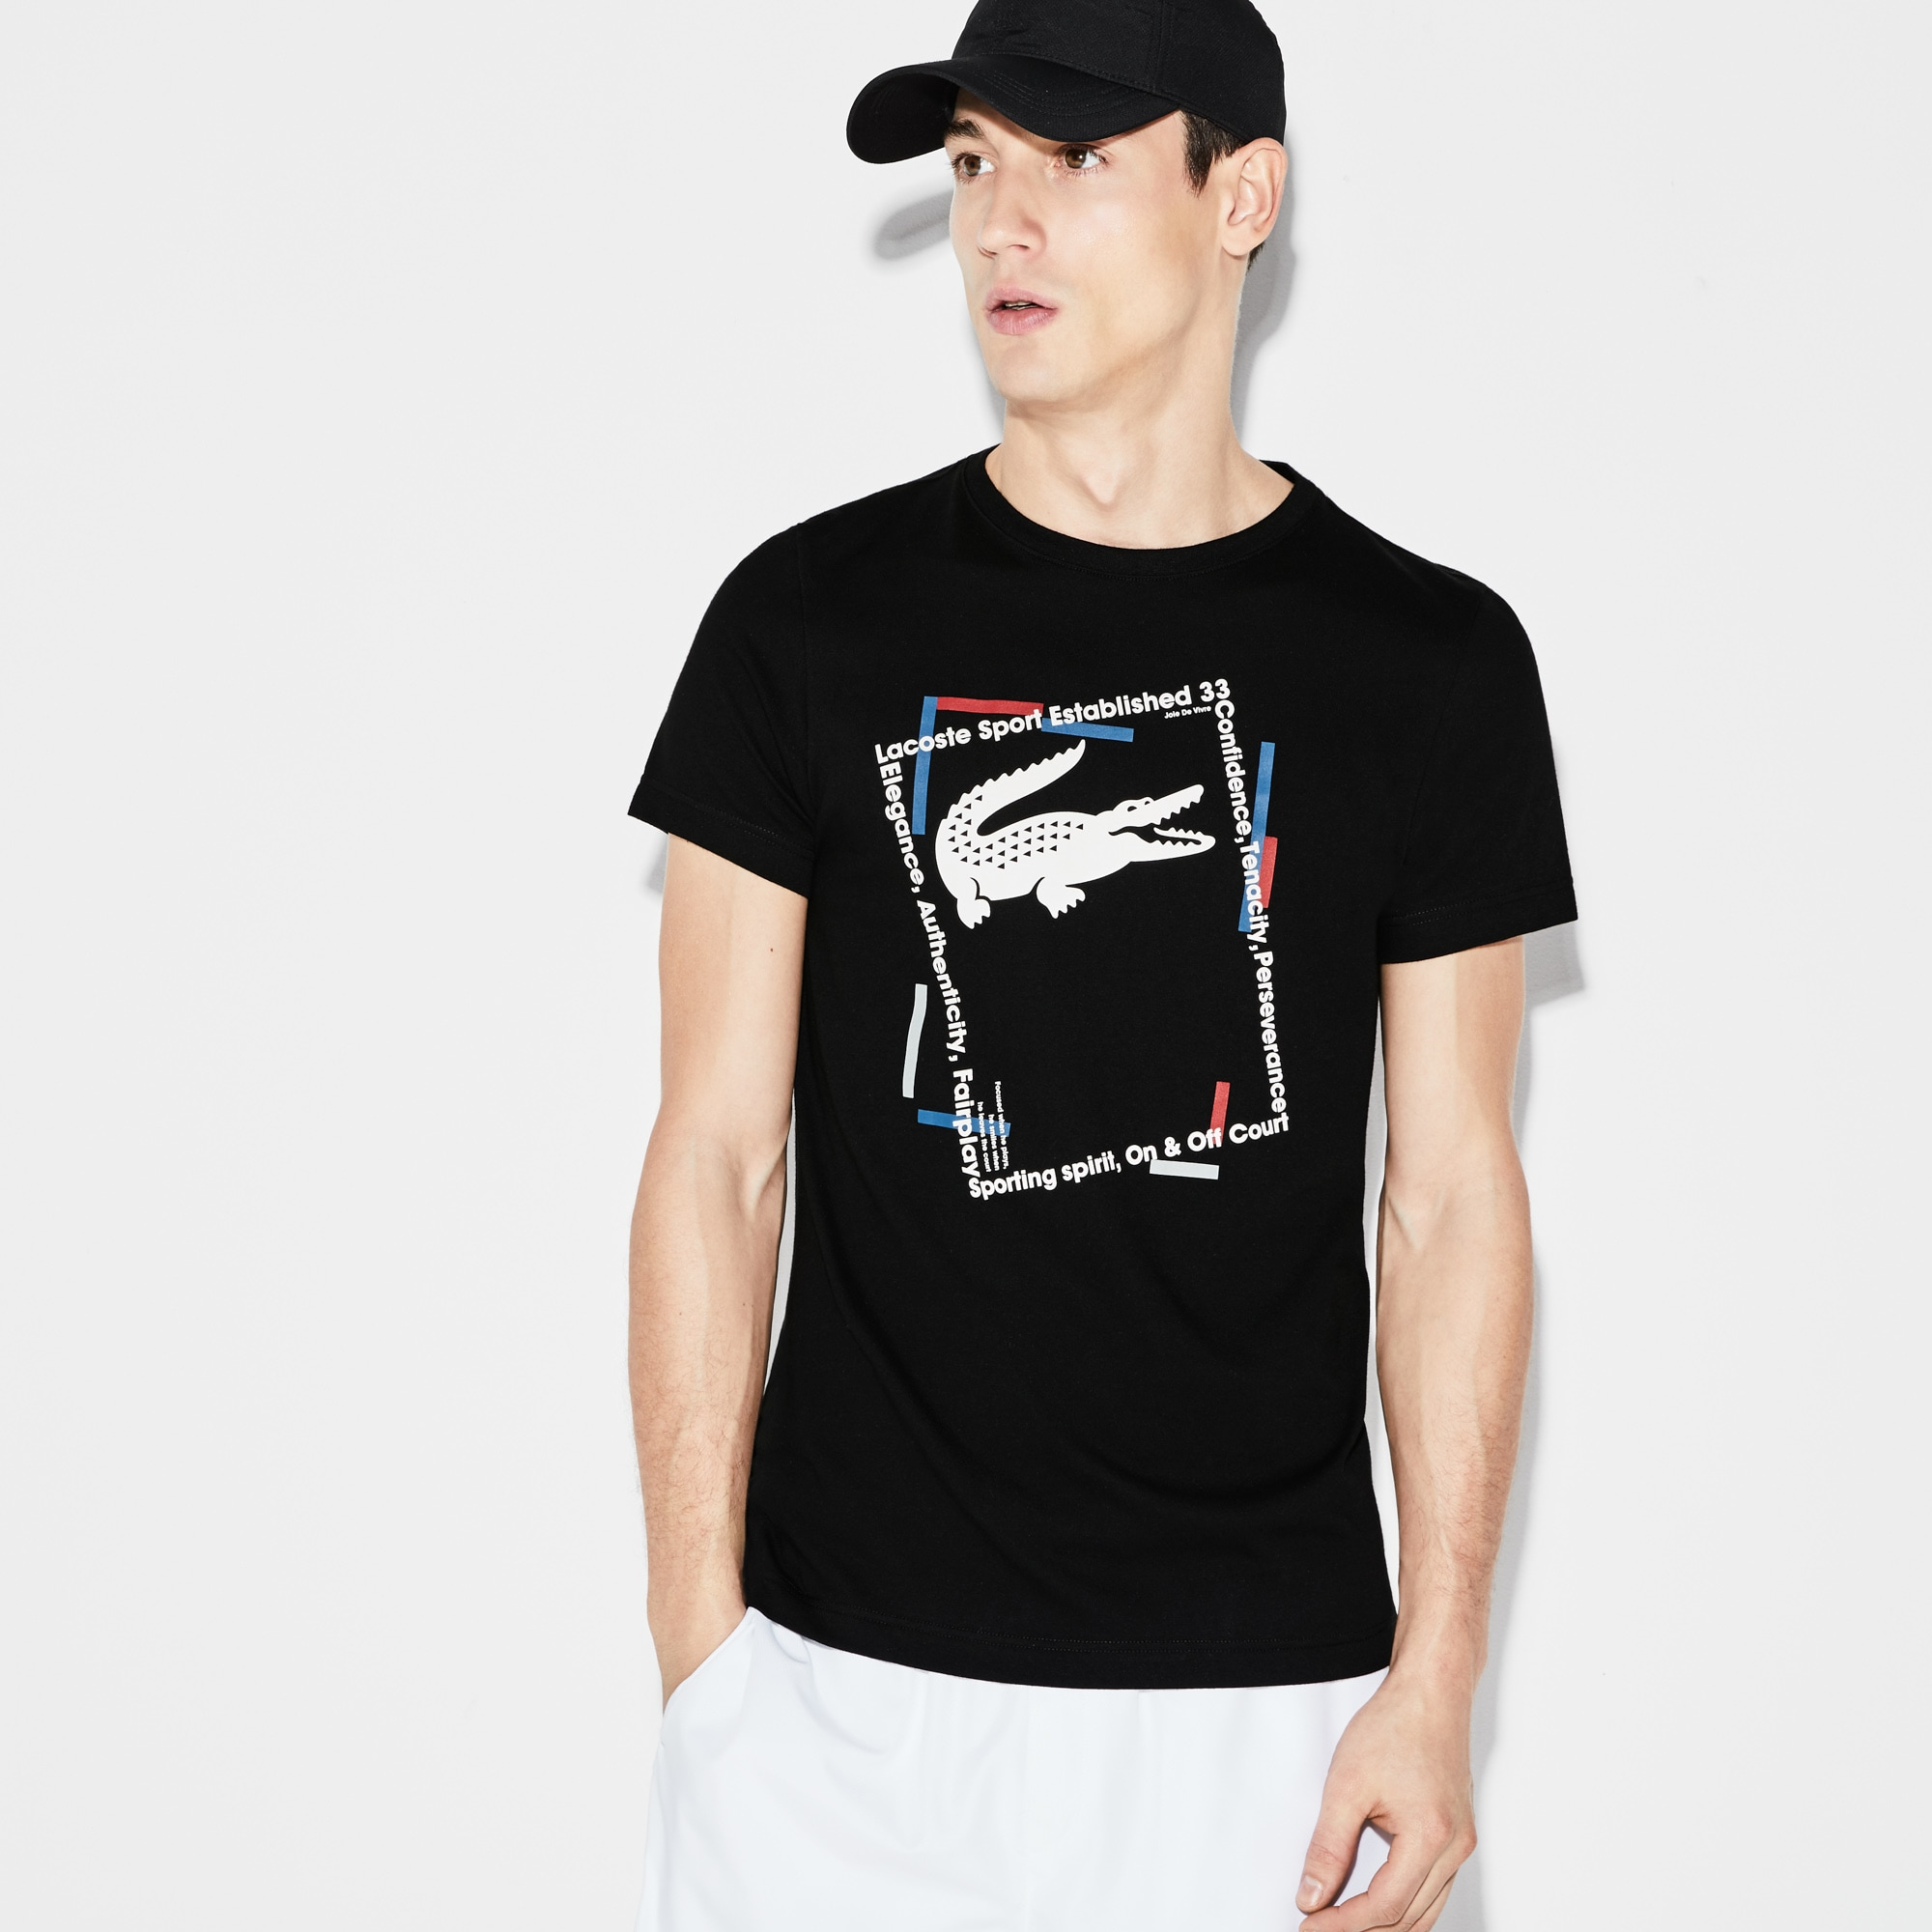 Camiseta Lacoste SPORT Tennis Masculina em Jérsei Técnico com Logo Lacoste